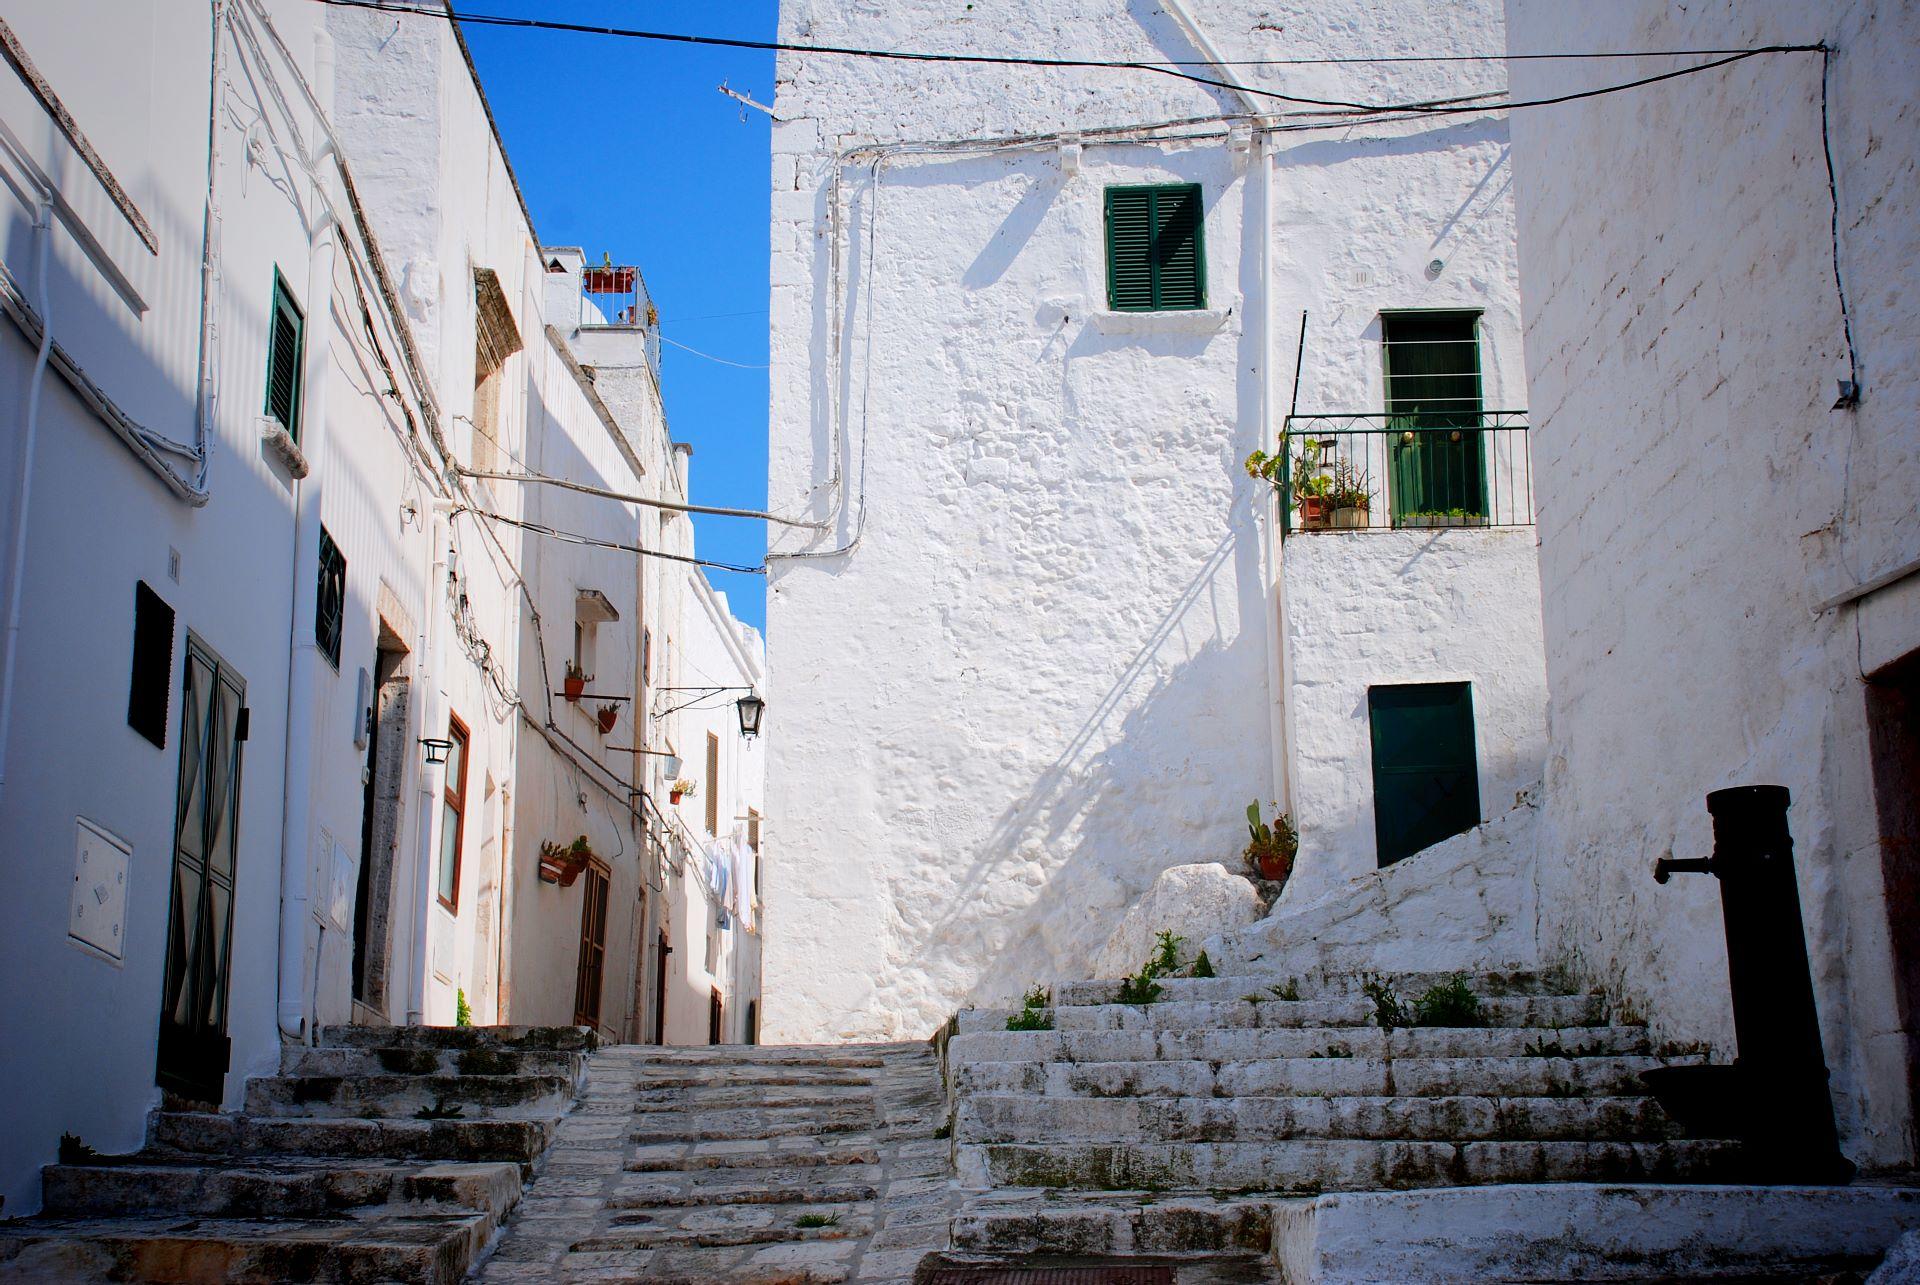 apulia slow travel ostuni gasse vicolo alley scale treppen stiege white white city die weiße stadt citta bianca stairs medioevo mittelalter valle d'itria